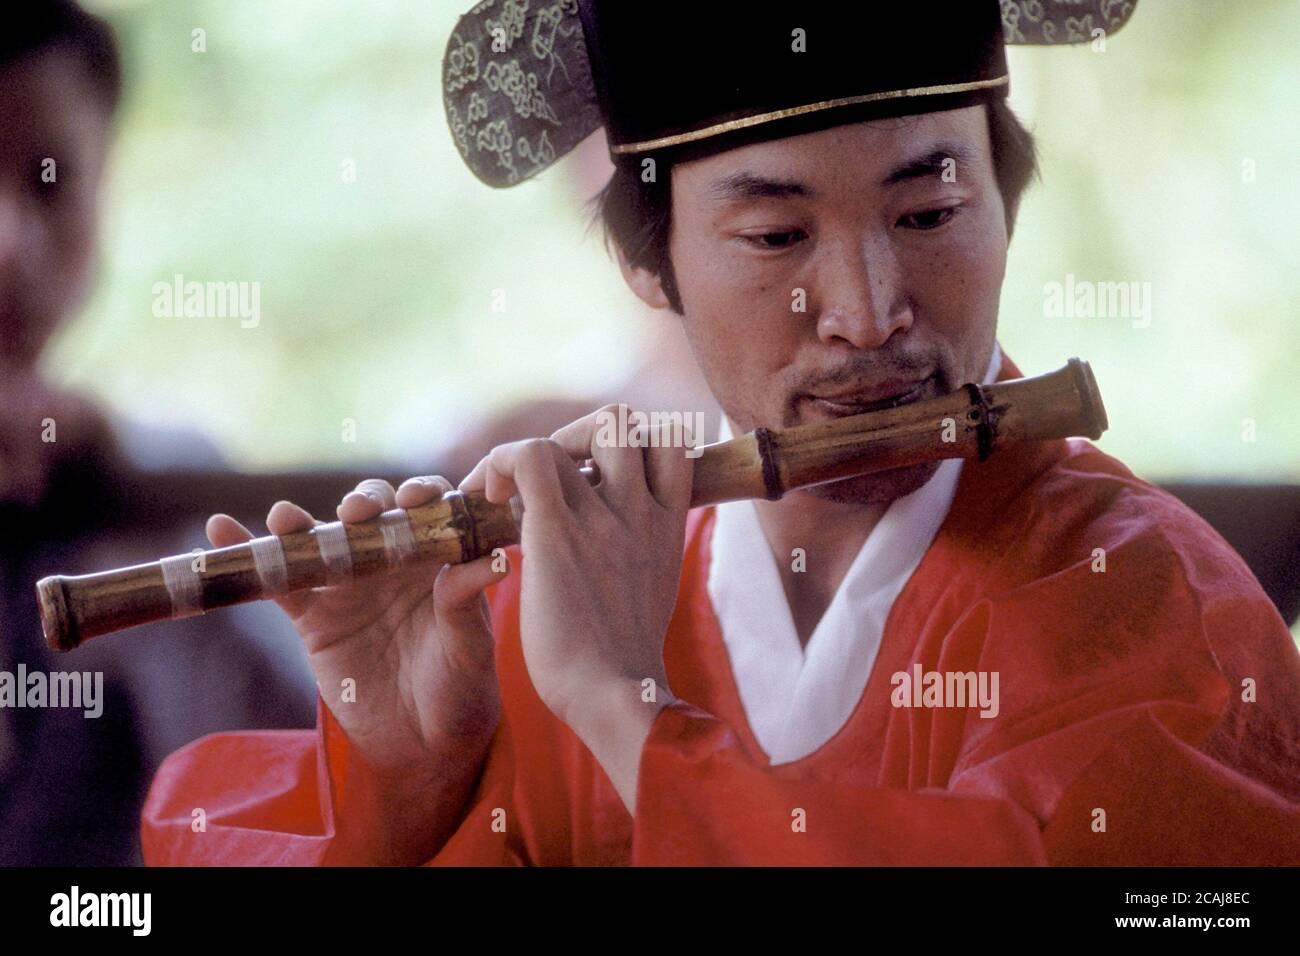 Man In Traditional Korean Dress Playing Wooden Flute At Korean Folk Village Bob Daemmrich Stock Photo Alamy